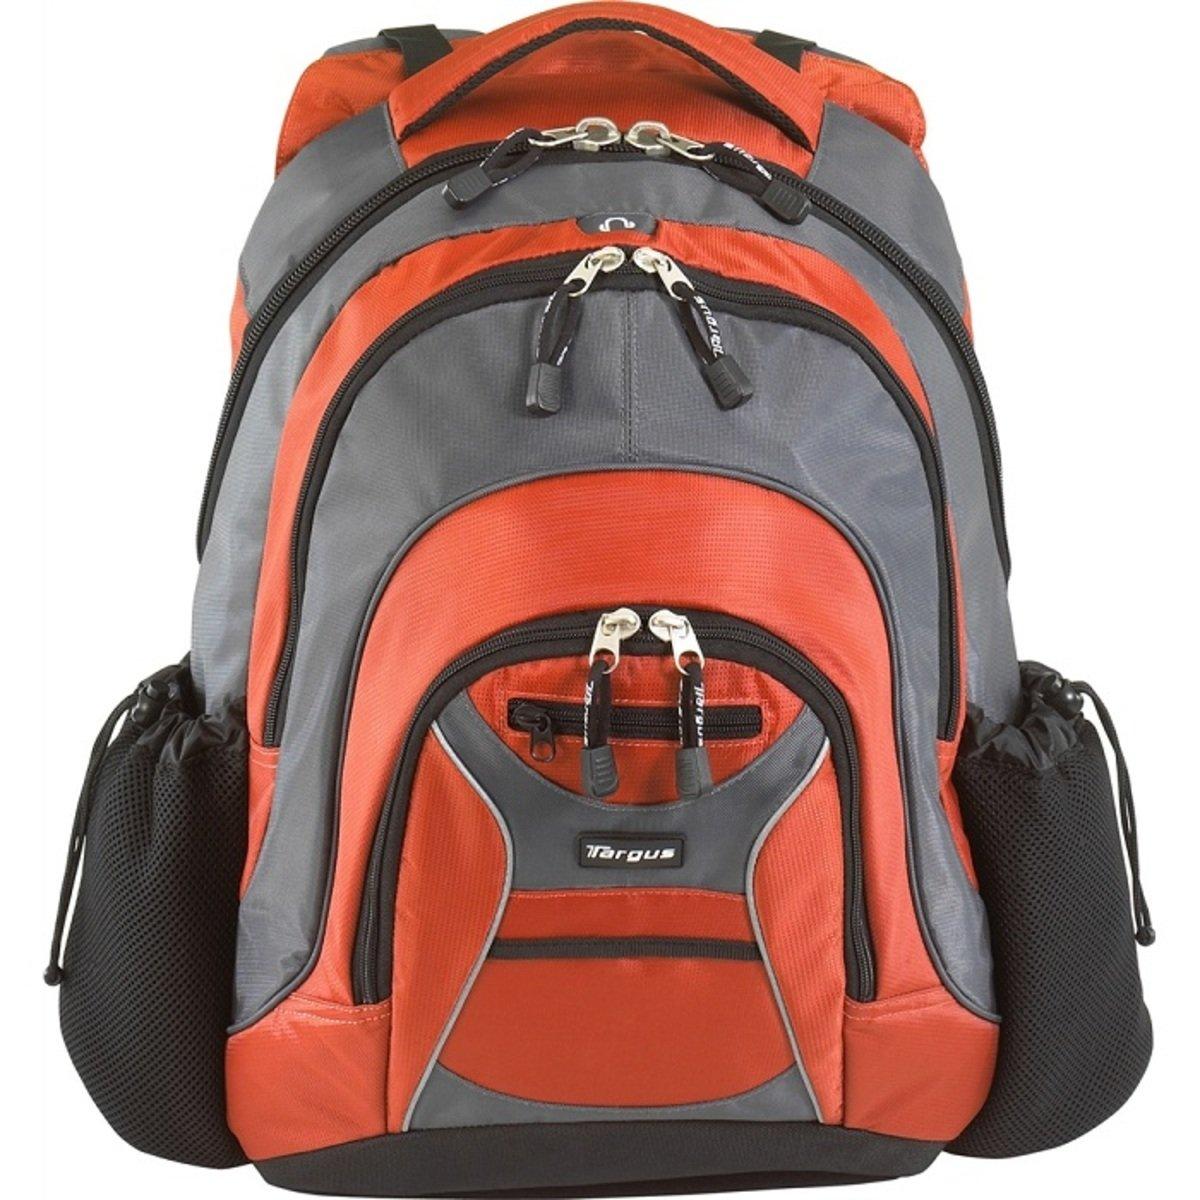 Feren Backpack